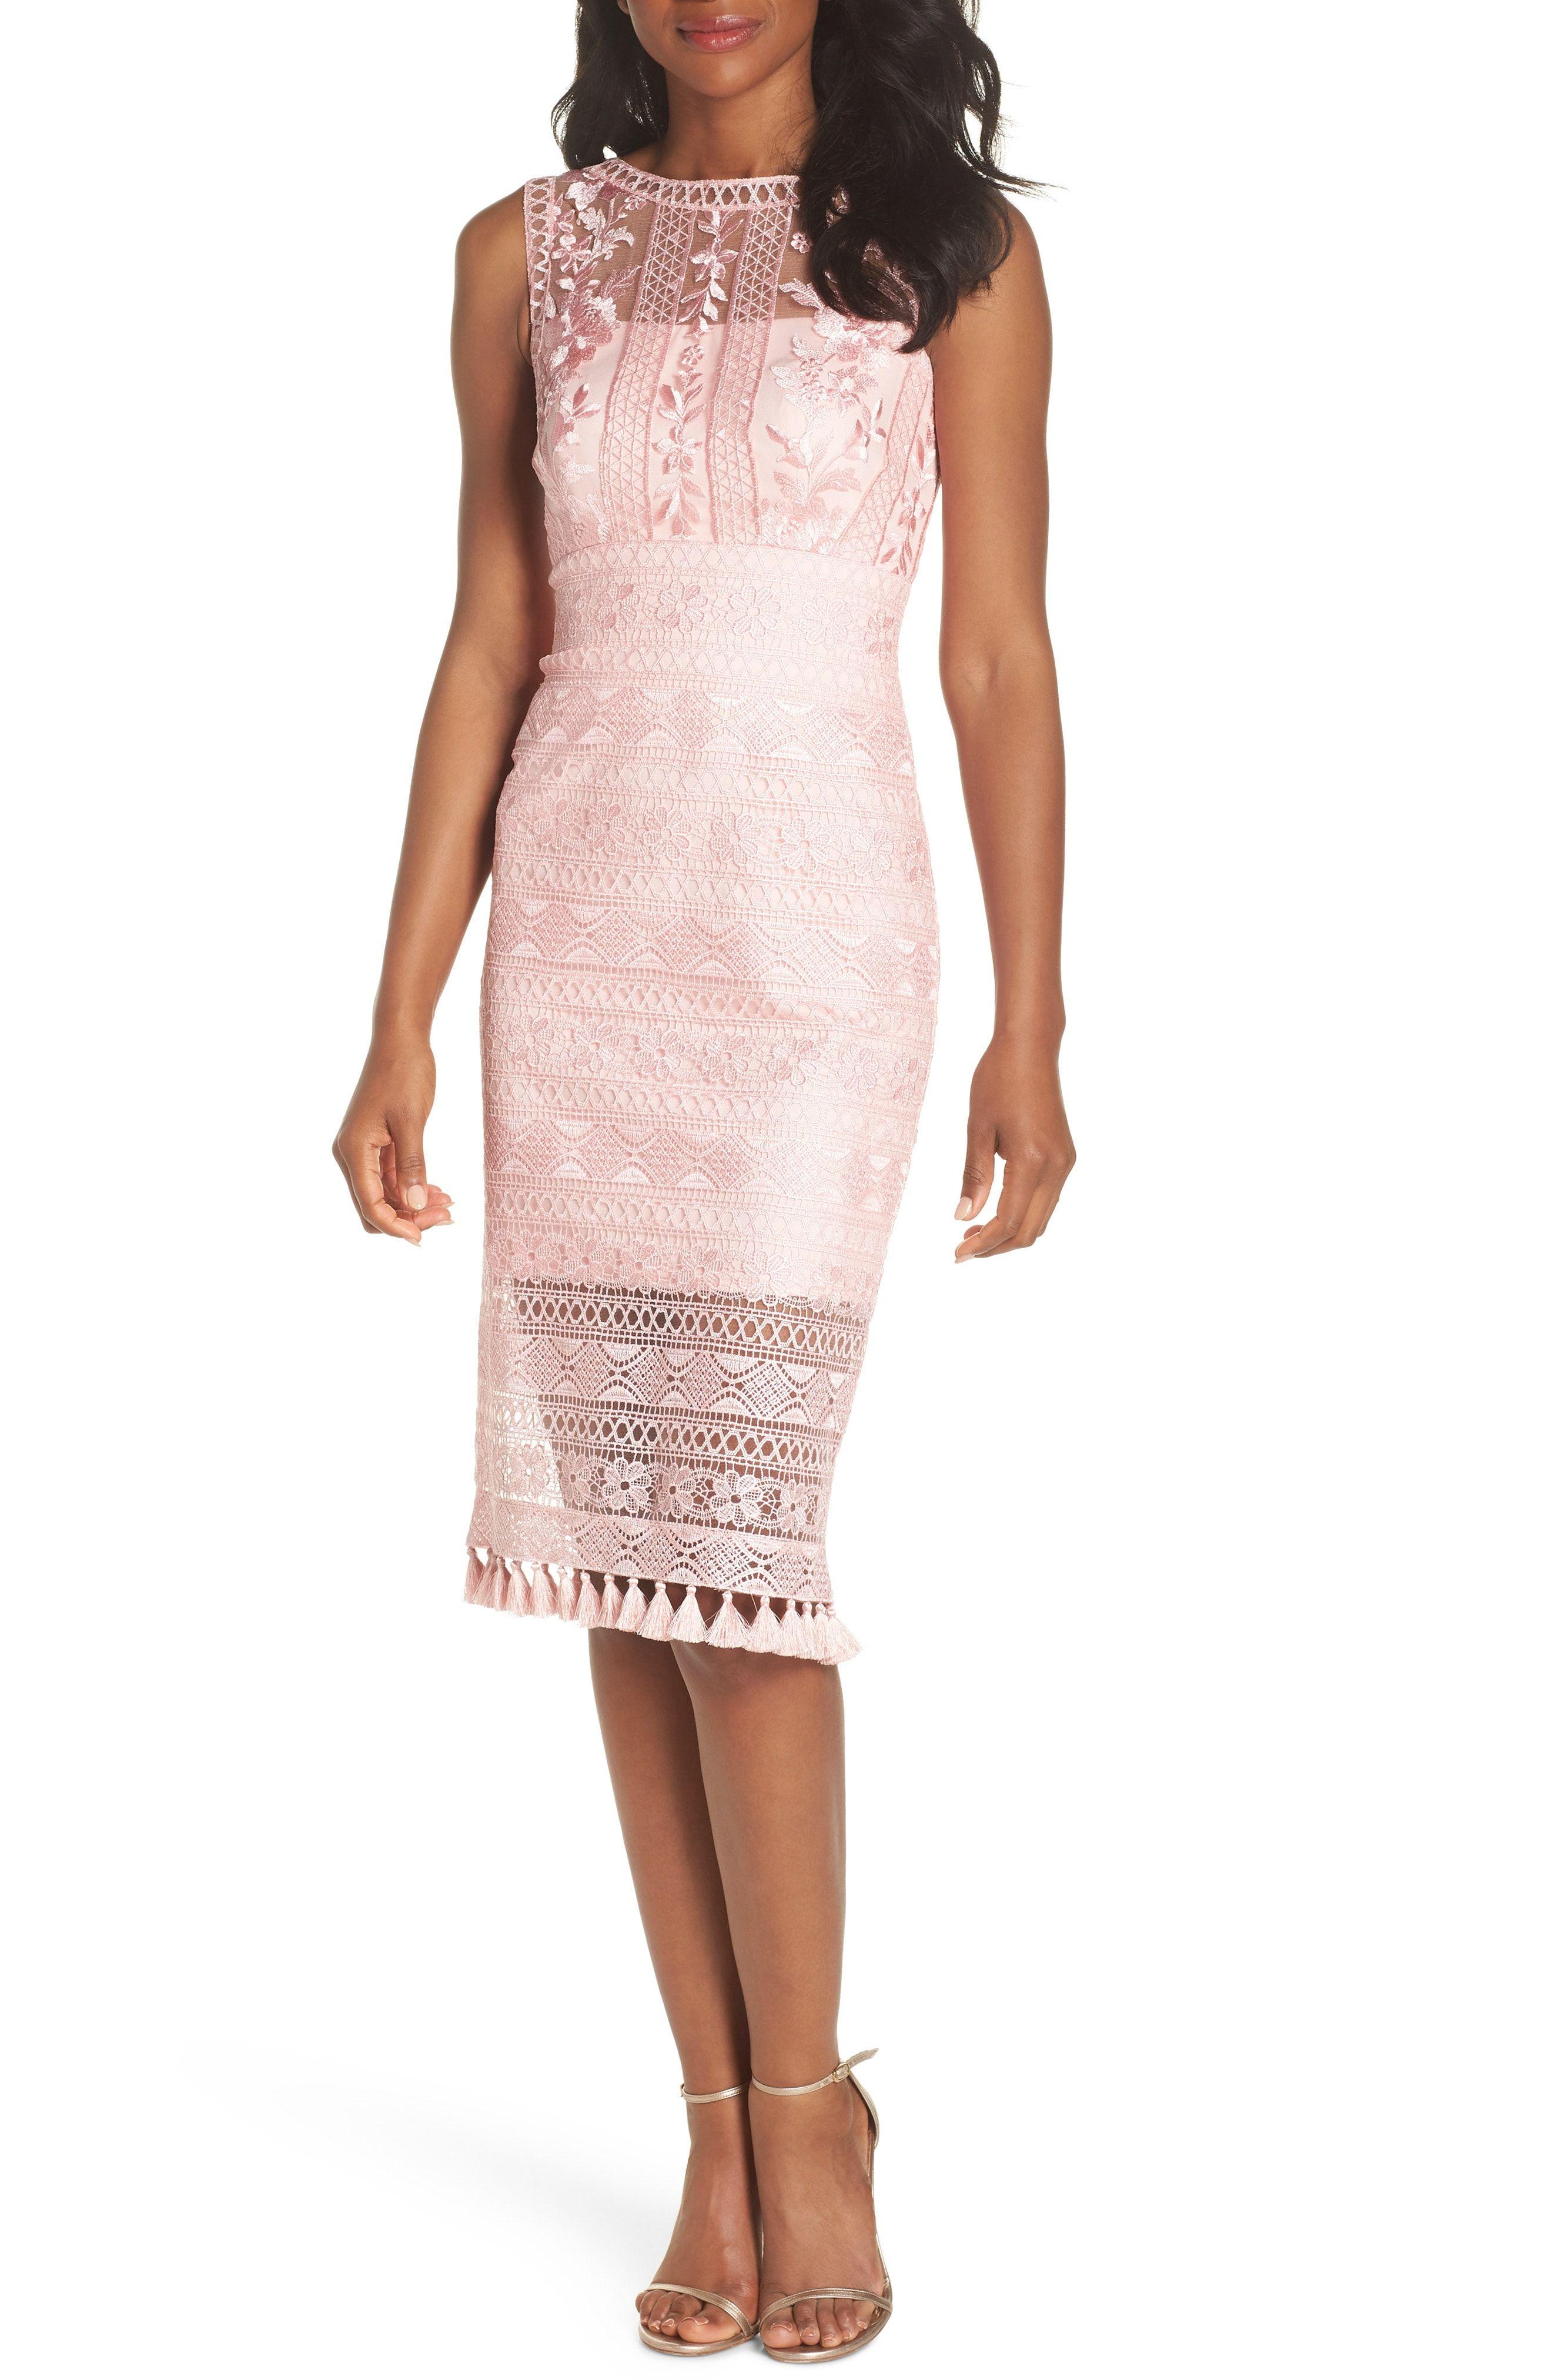 eb904a6410f Buy Tadashi Shoji Embroidered Lace Sheath Dress online. Sku  qkev95956pcqy53805